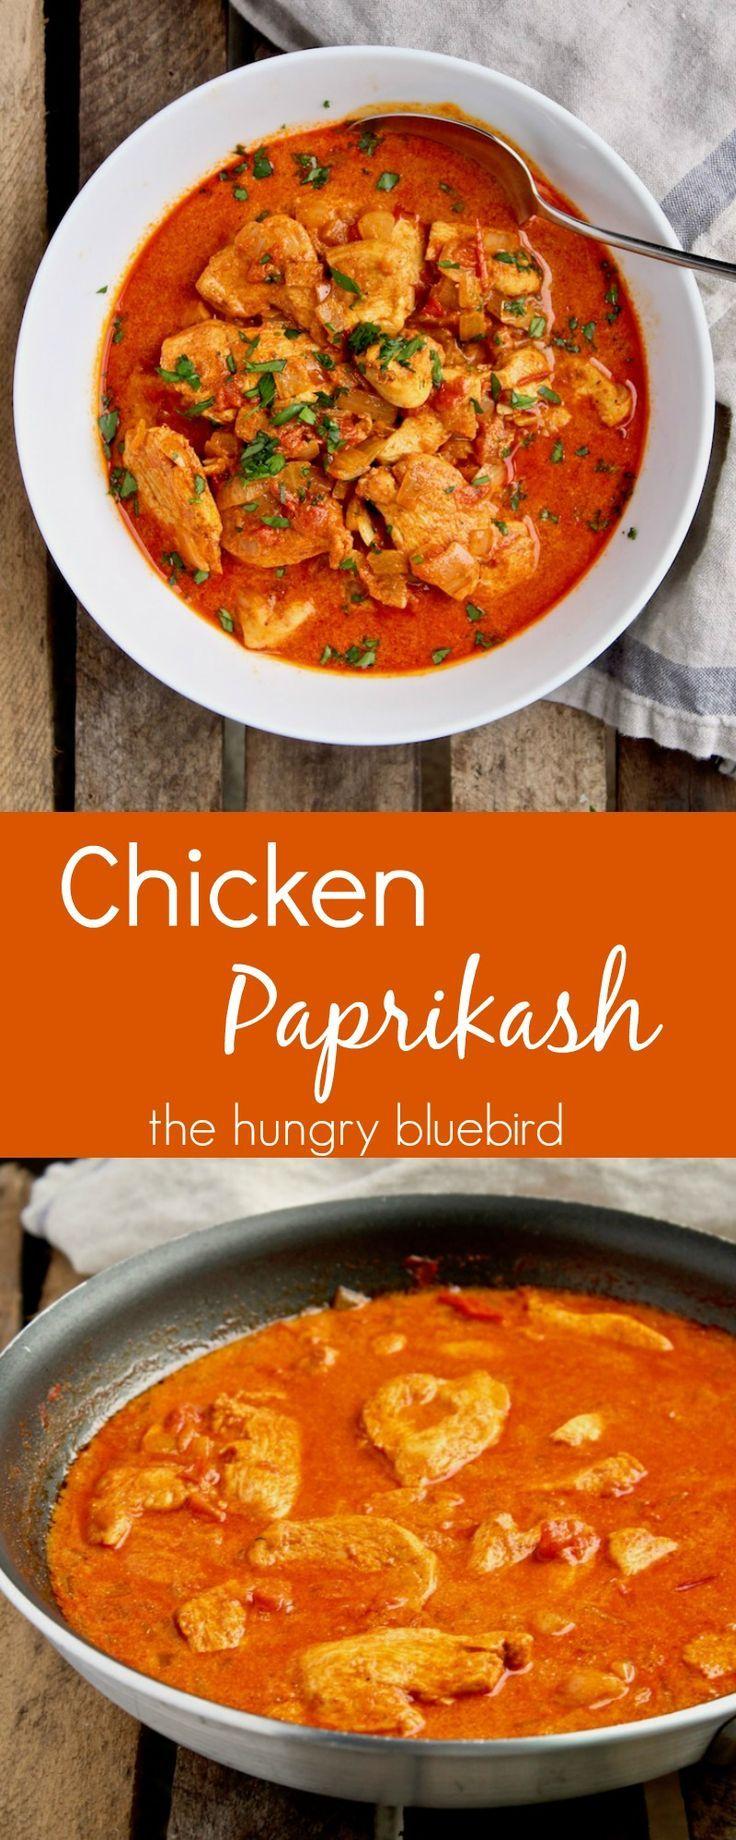 Chicken Paprikash Recipe Chicken Paprikash Cooking Recipes Hungarian Paprika Chicken